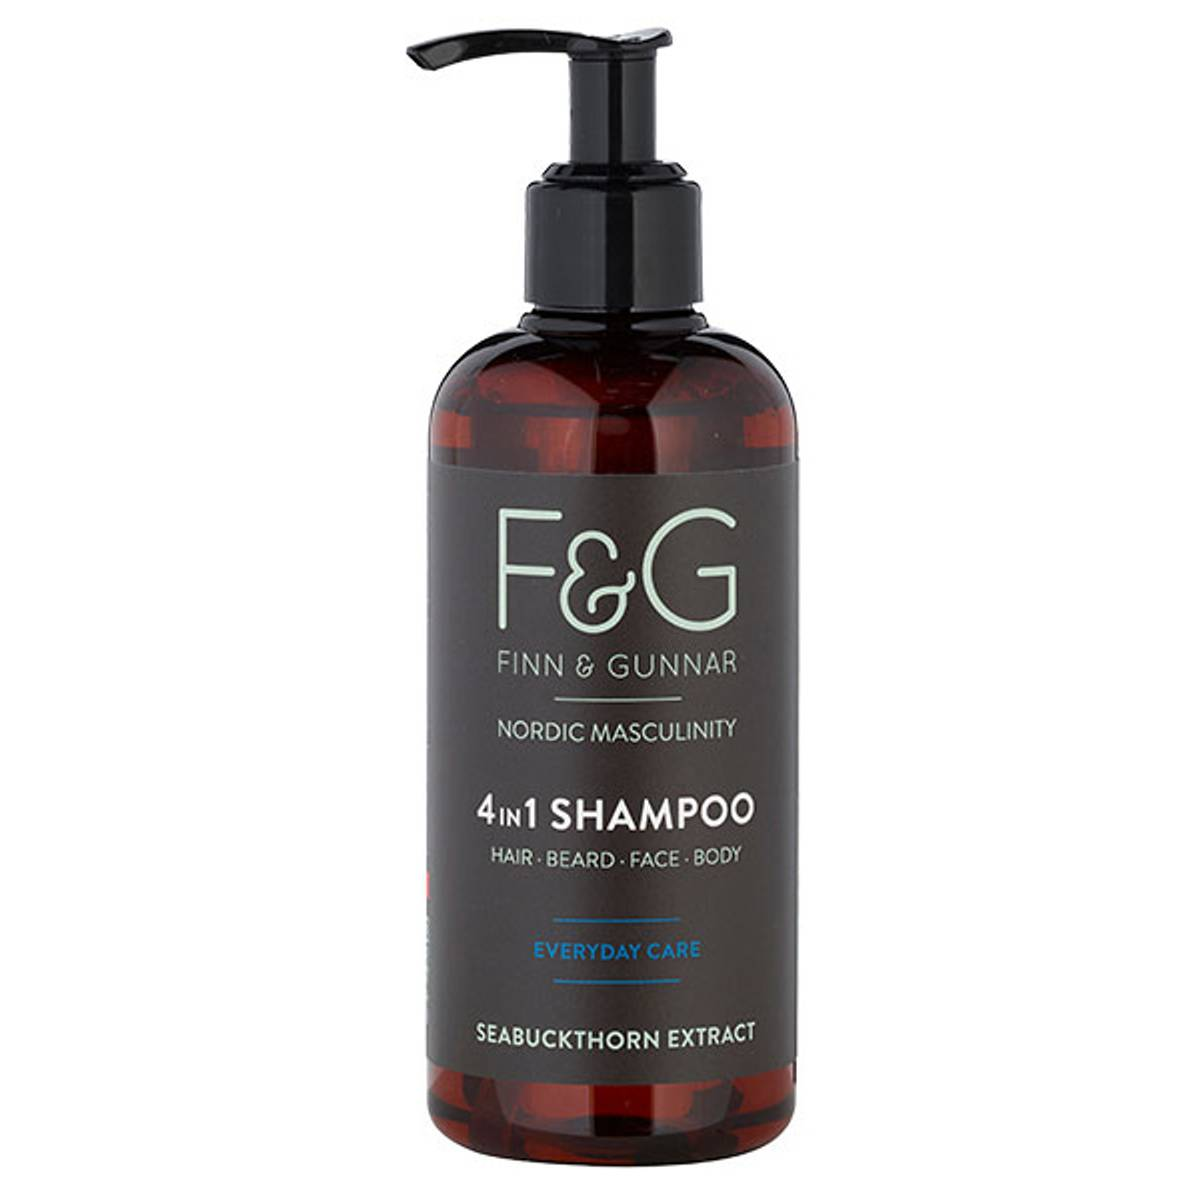 F&G Nordic Masculinity 4 in 1 Shampoo 250 ml